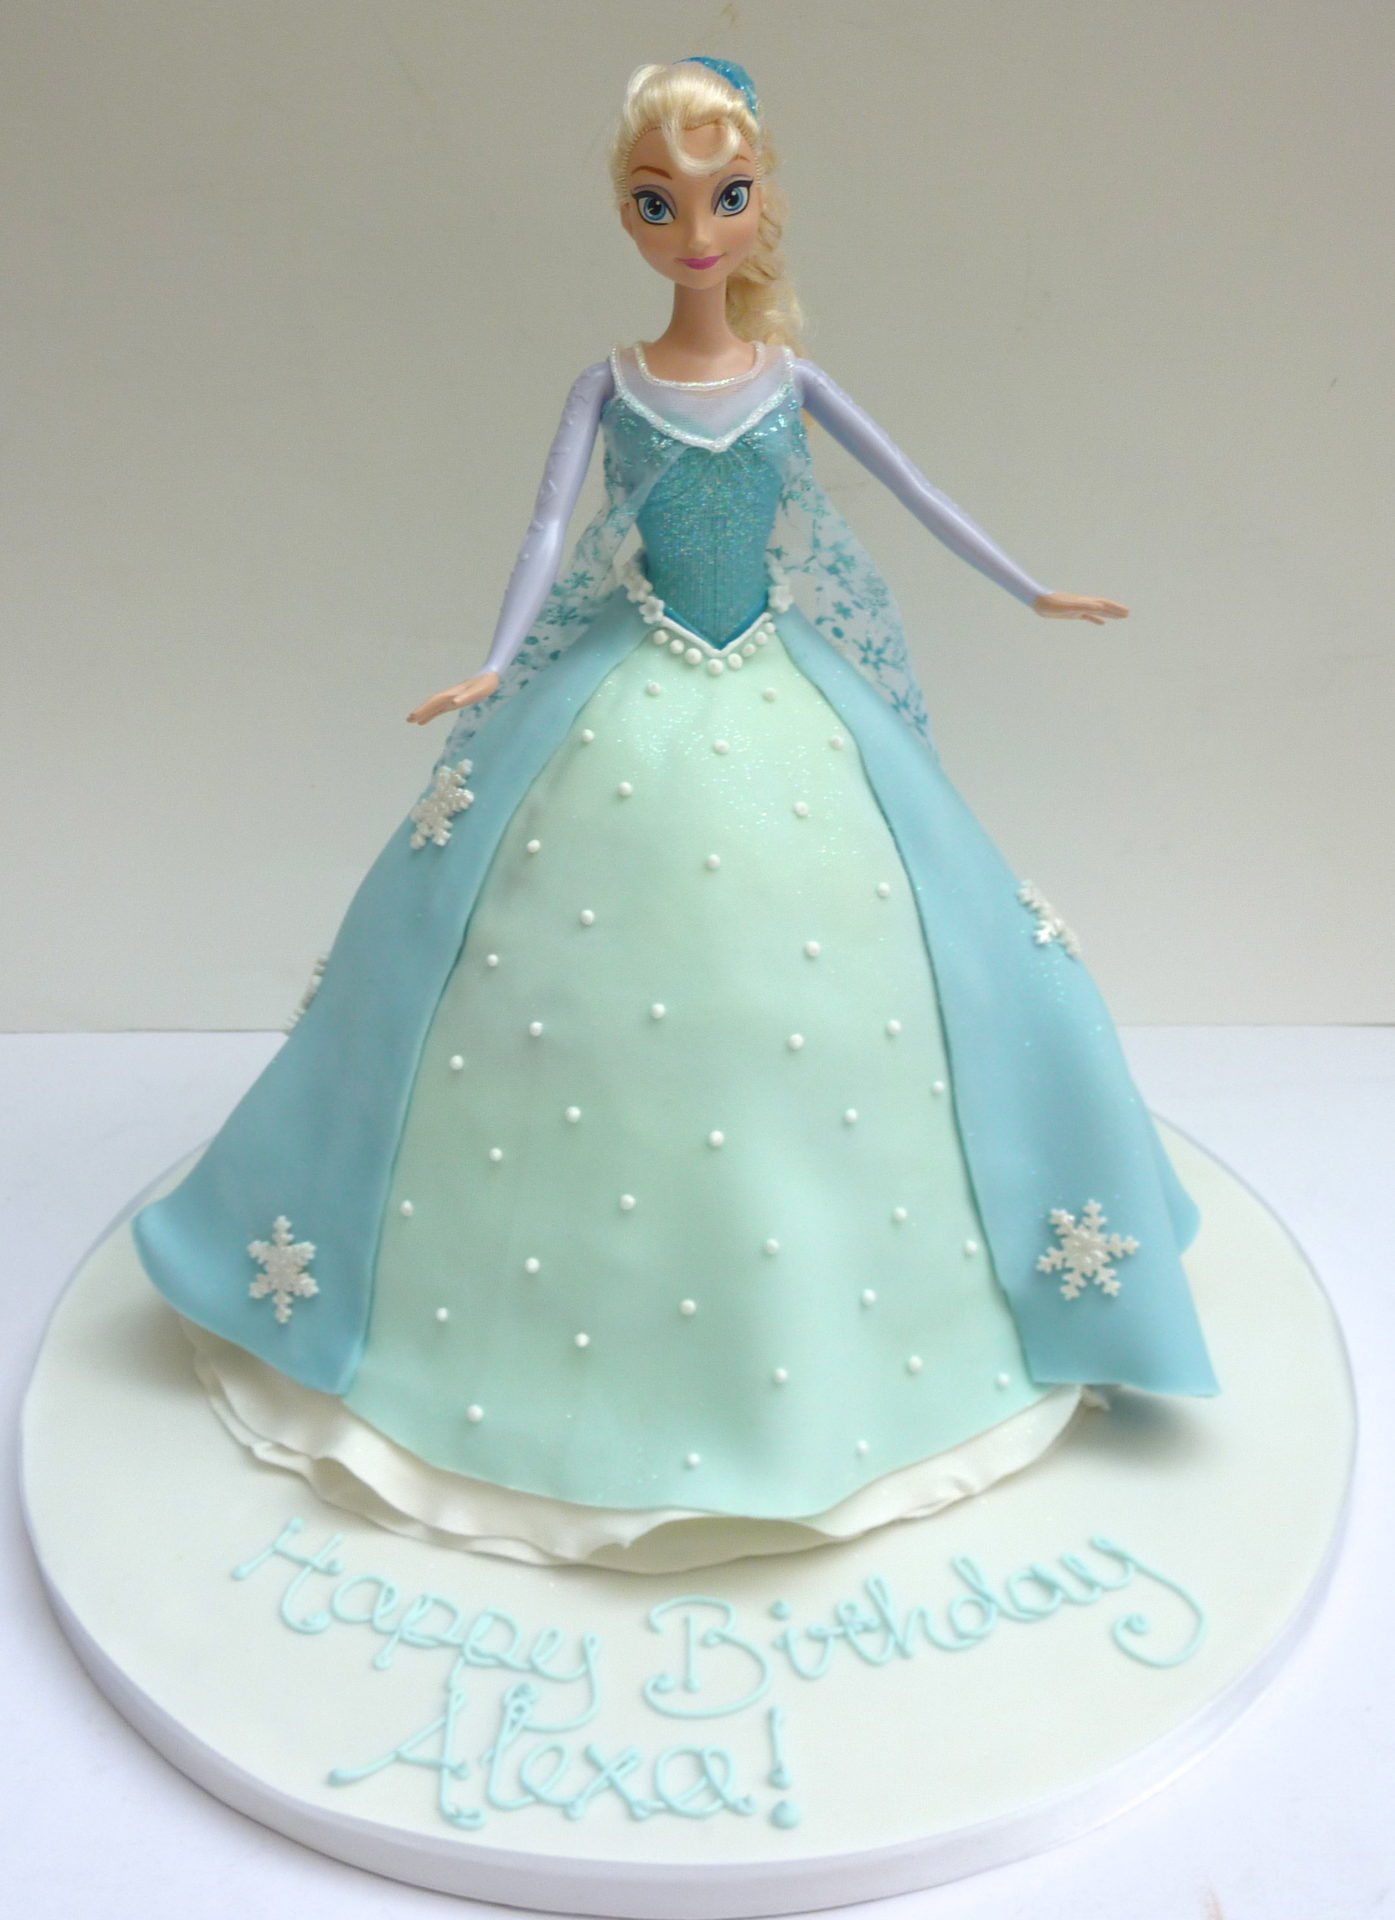 Elsa Cake Etoile Bakery